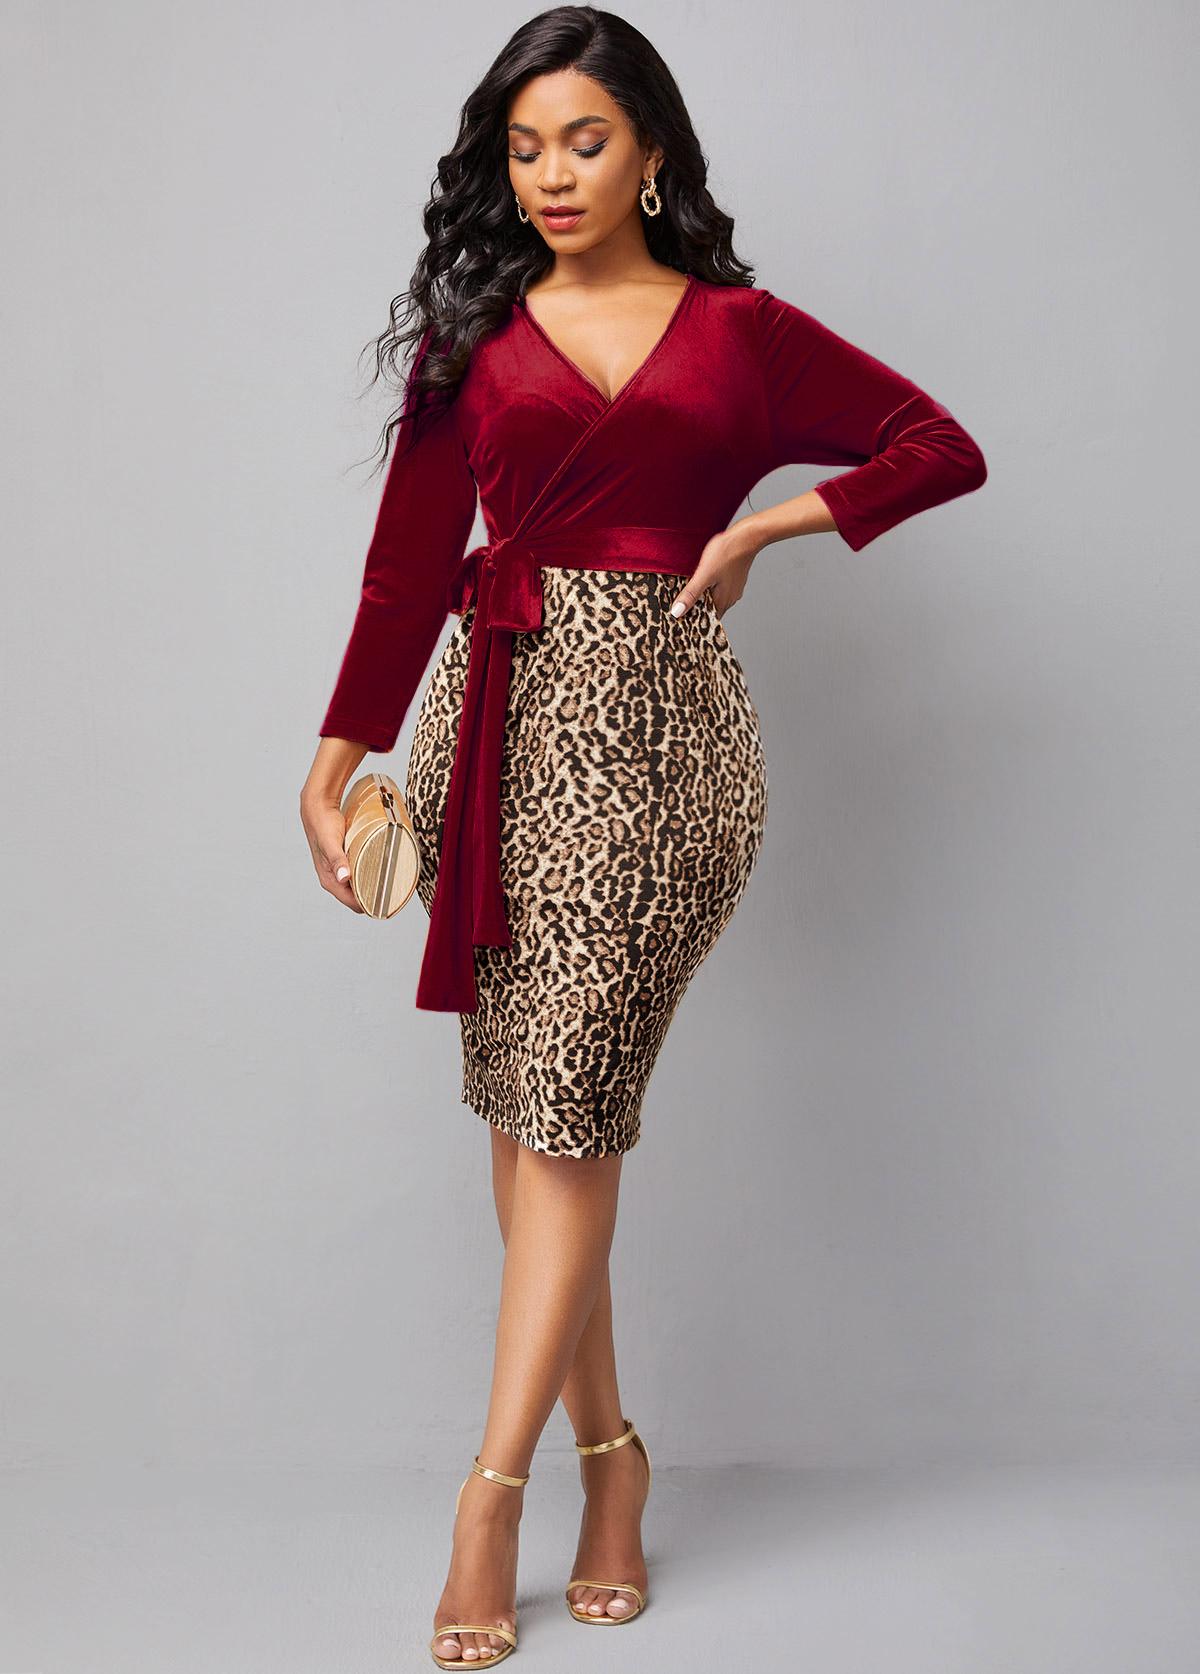 Velvet Leopard Cross Front Tie Side Dress